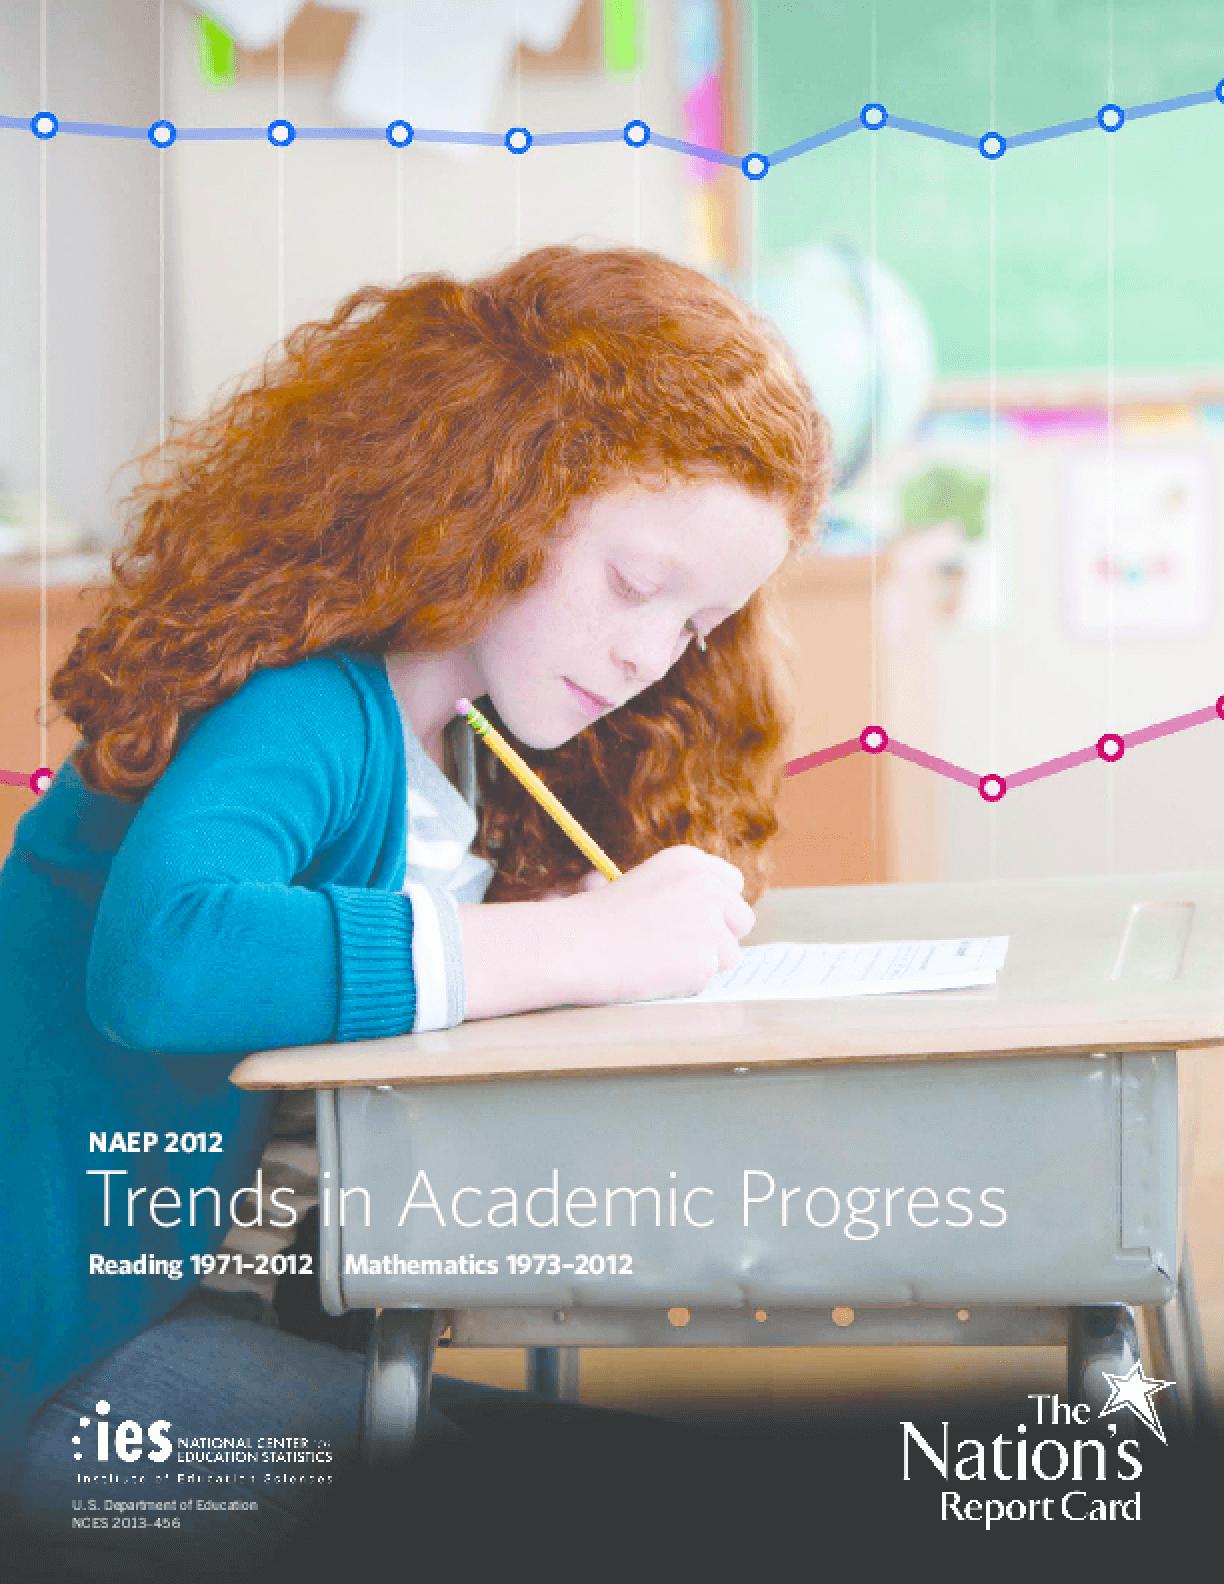 NAEP 2012: Trends in Academic Progress